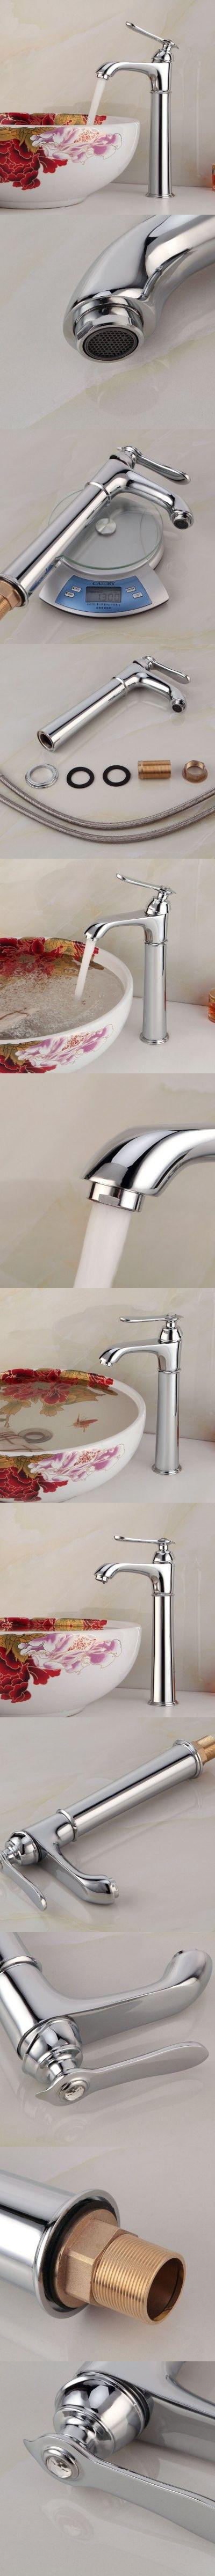 Bathroom   Lidanda Gaosi Bathroom Brass Basin Mixer Tap Water Faucet with Single Port $50.96